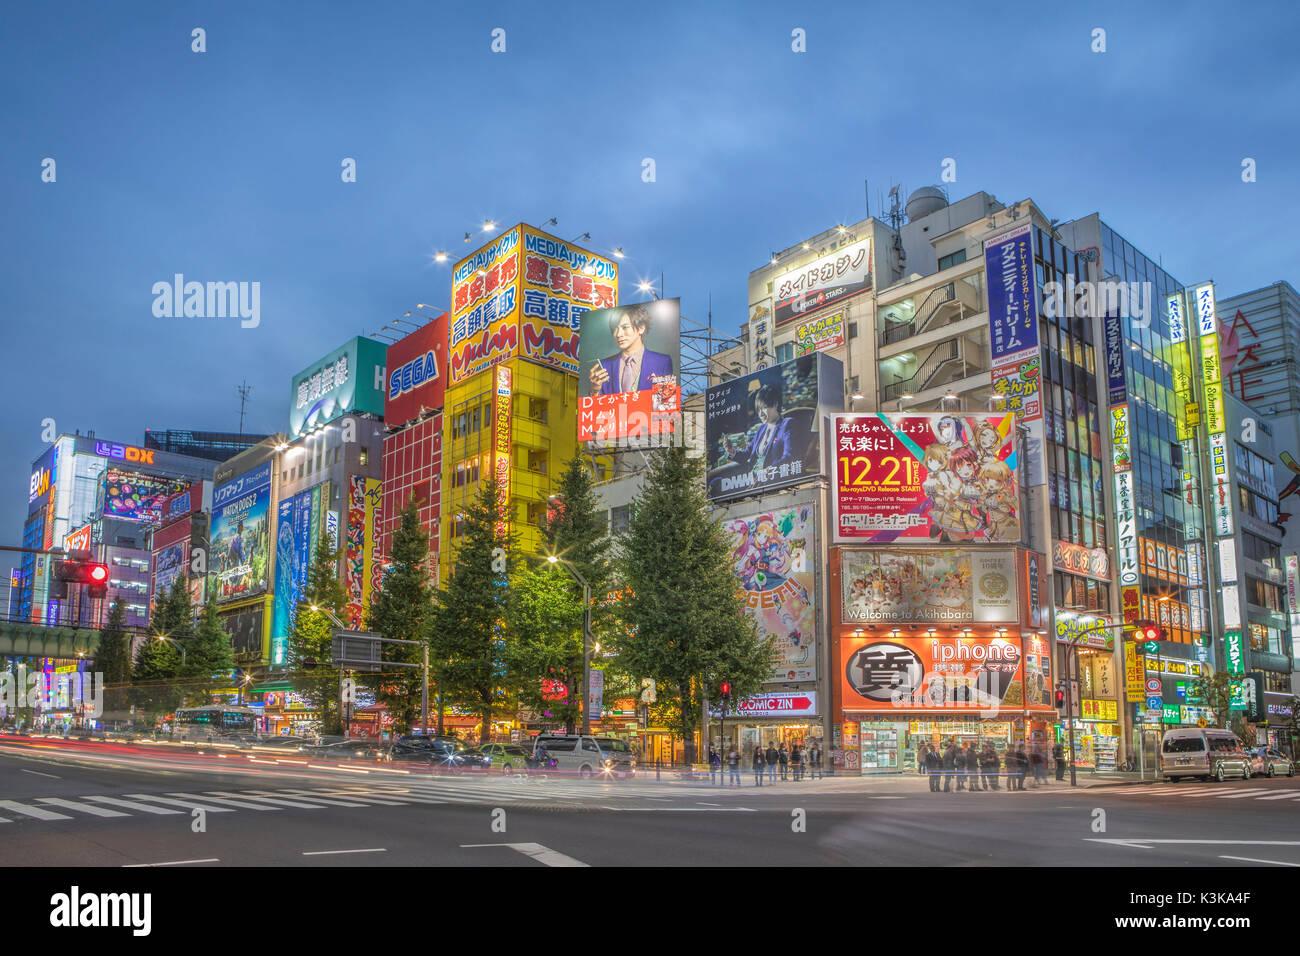 Japan, Tokyo City, Akihabara District, Chuo Avenue - Stock Image